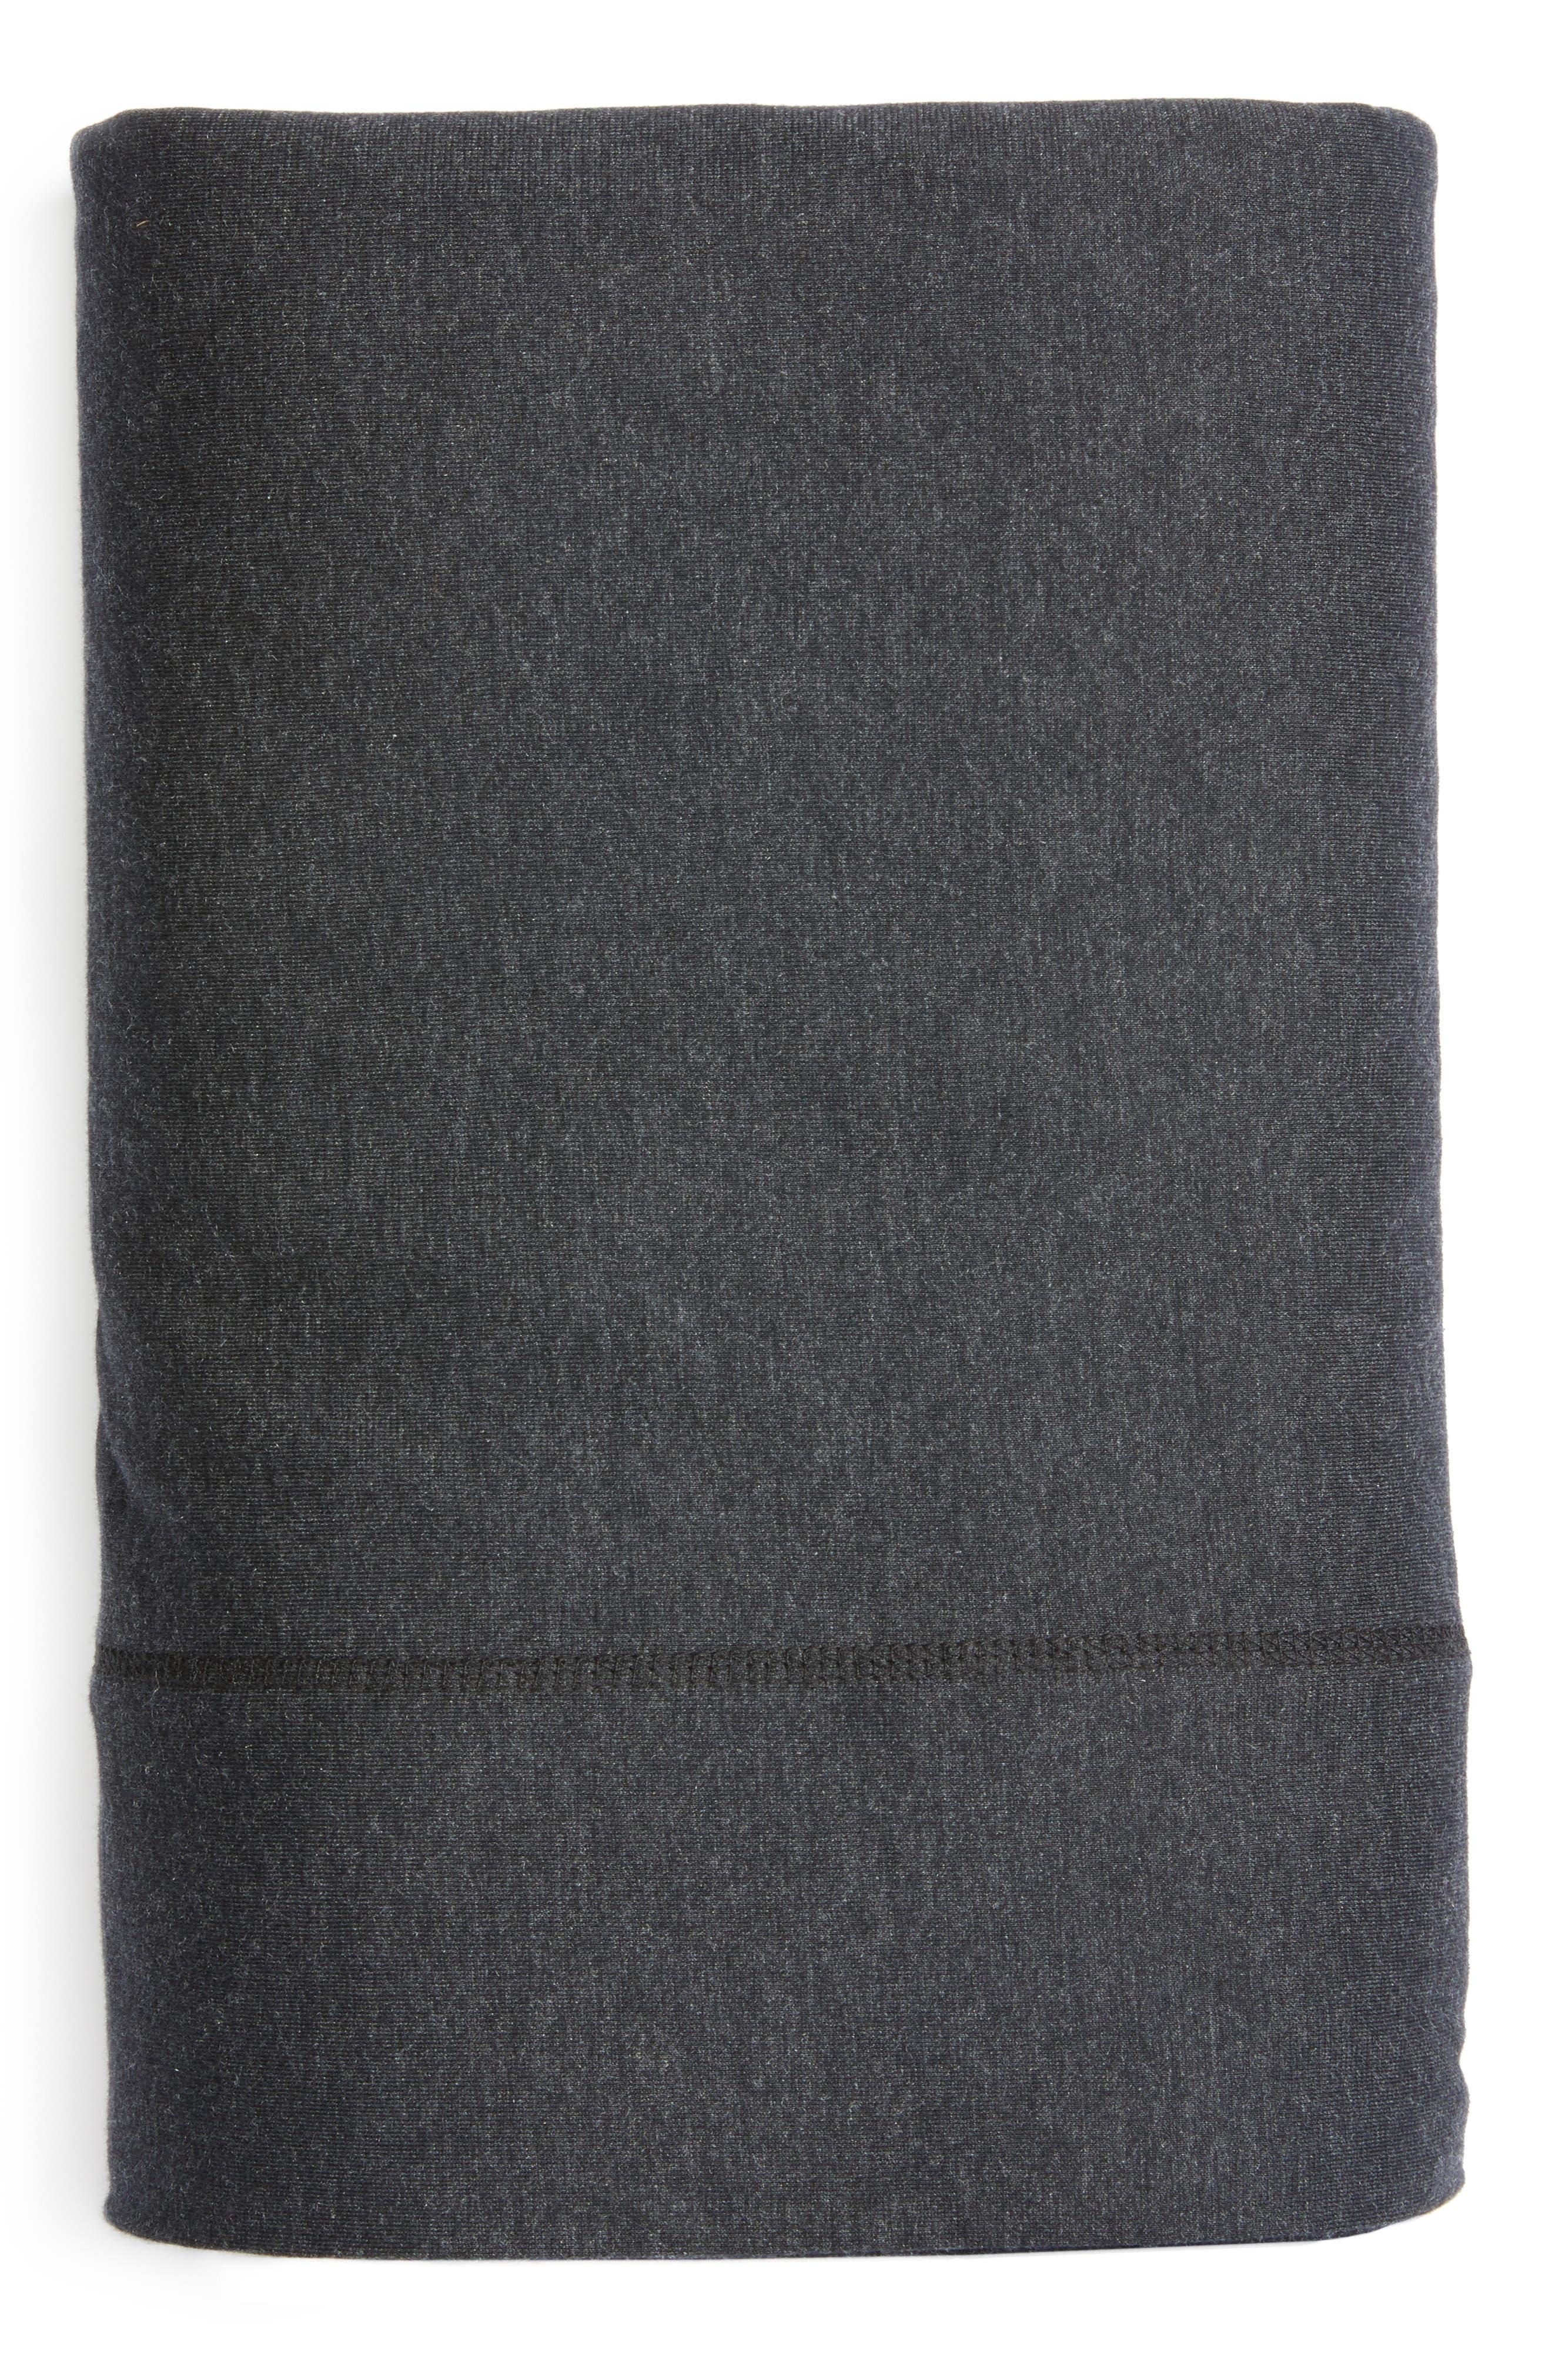 Main Image - Calvin Klein Home Cotton & Modal Jersey Flat Sheet